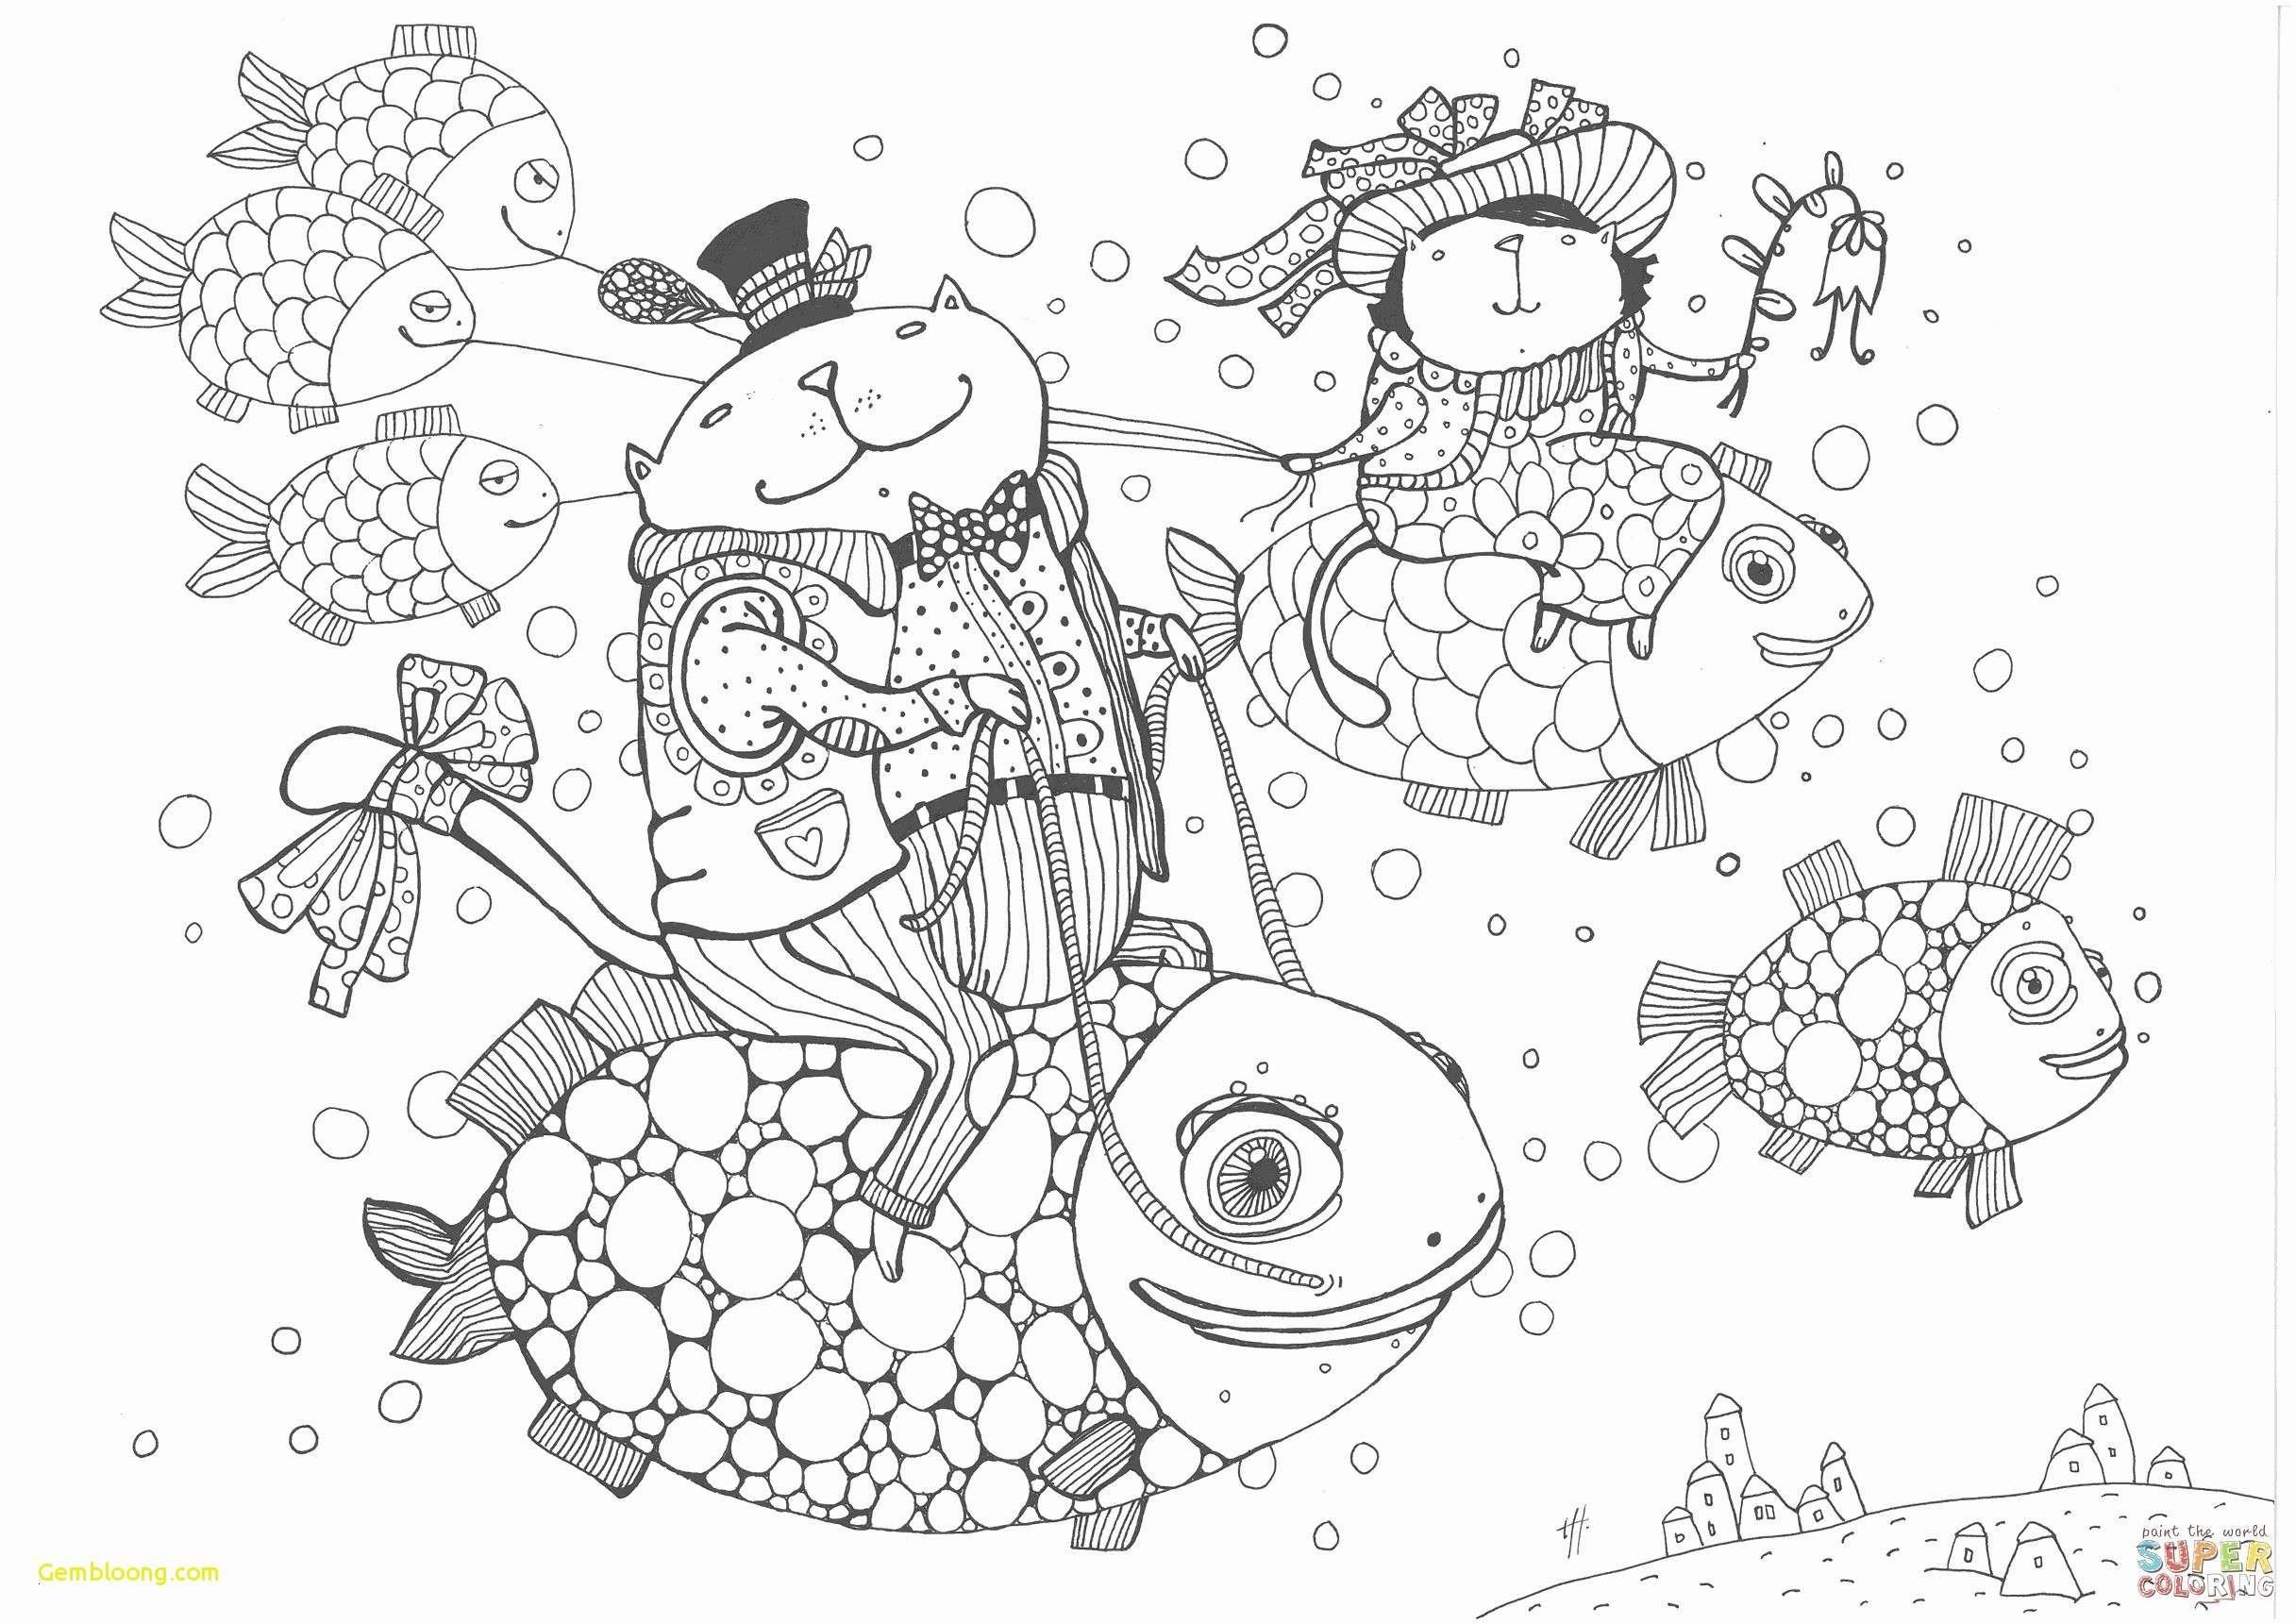 35 Pilze Malvorlagen Scoredatscore Best Micky Maus Ausmalbilder